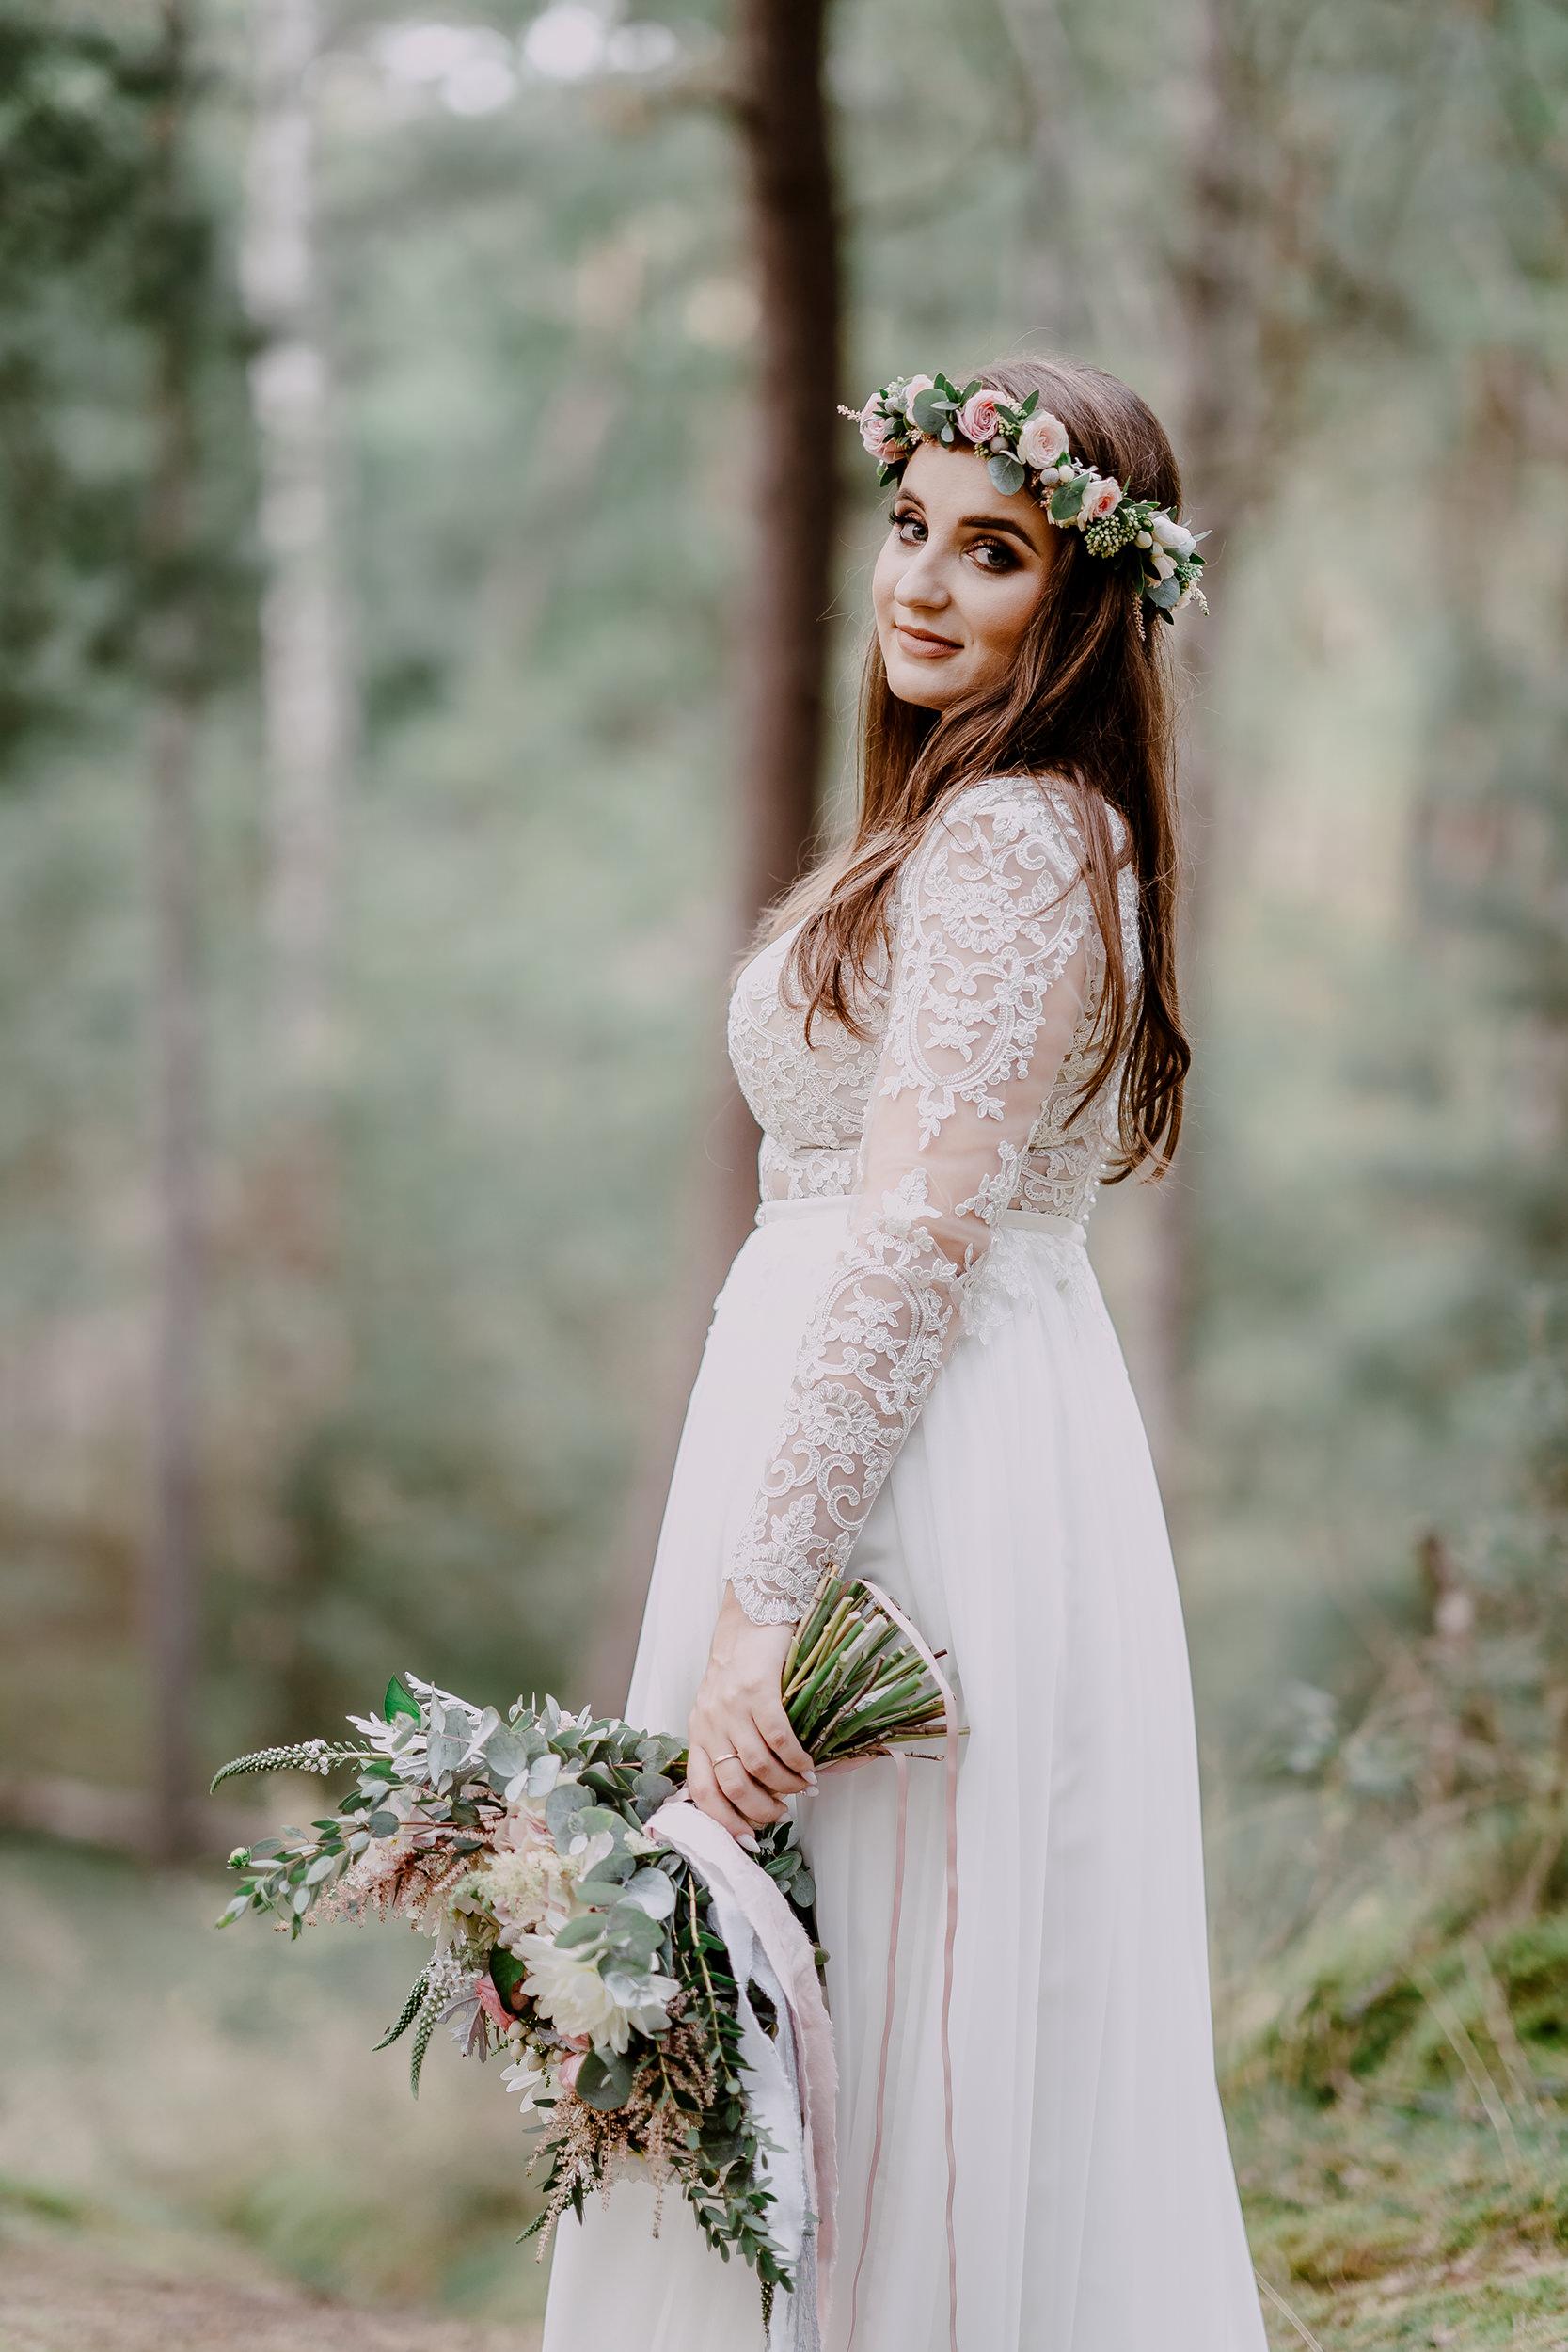 fotograf ślubny toruń.jpg